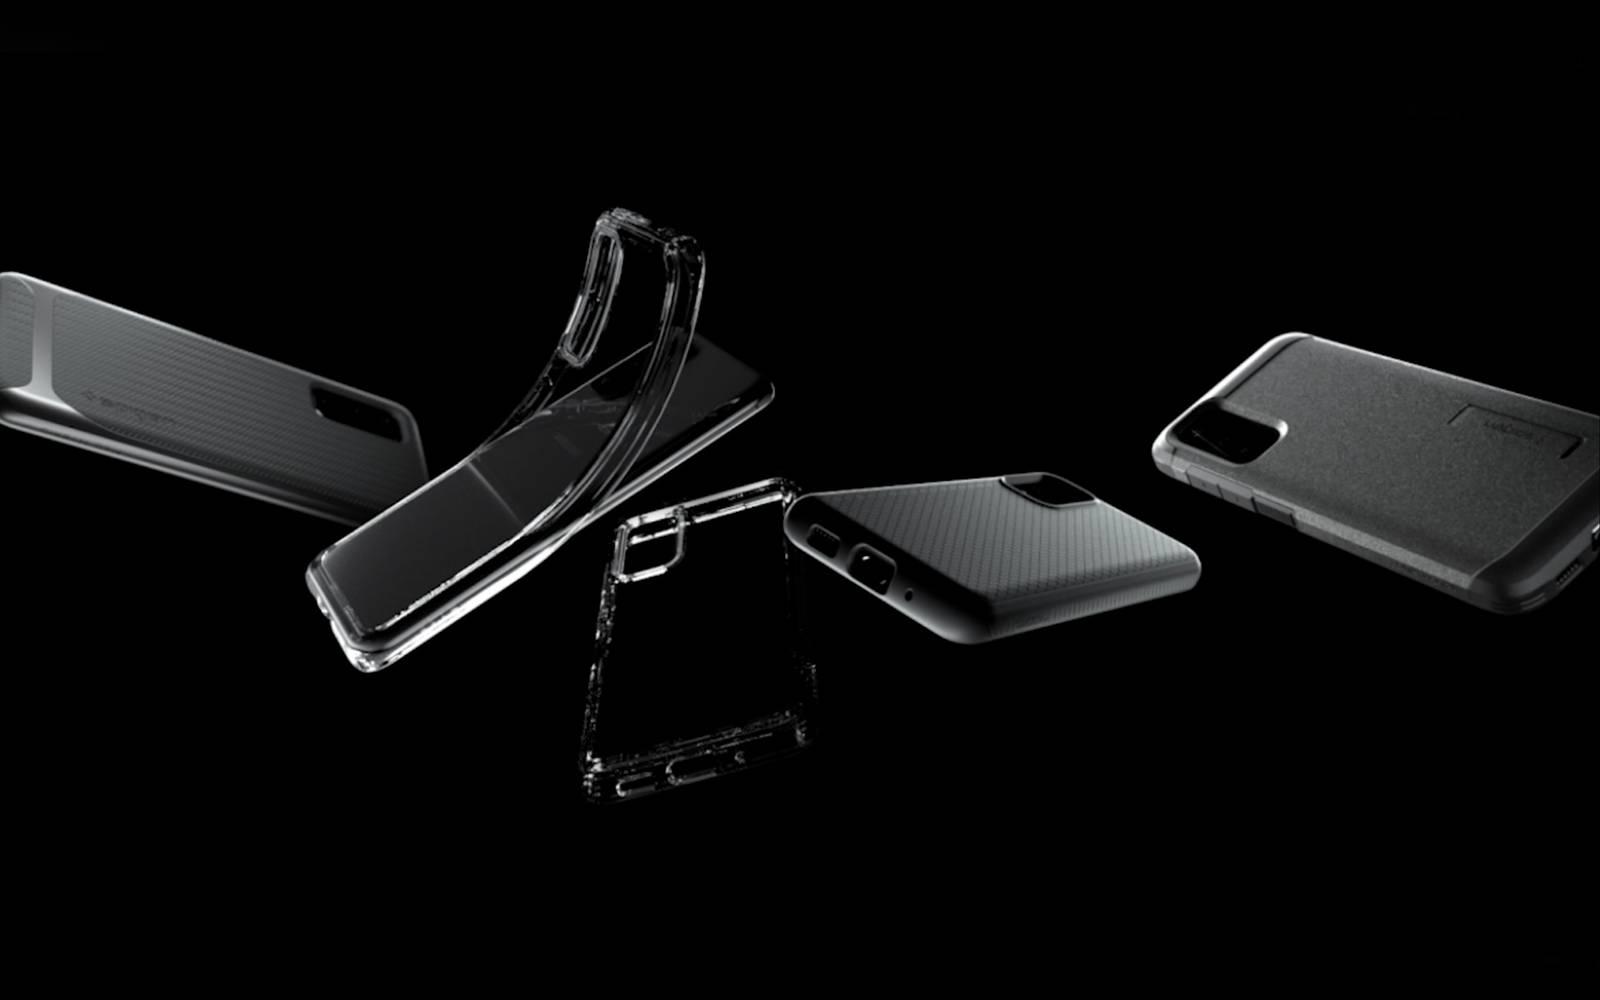 Custodia Samsung Galaxy S4 Custodie Telefoni Spider Resistenti